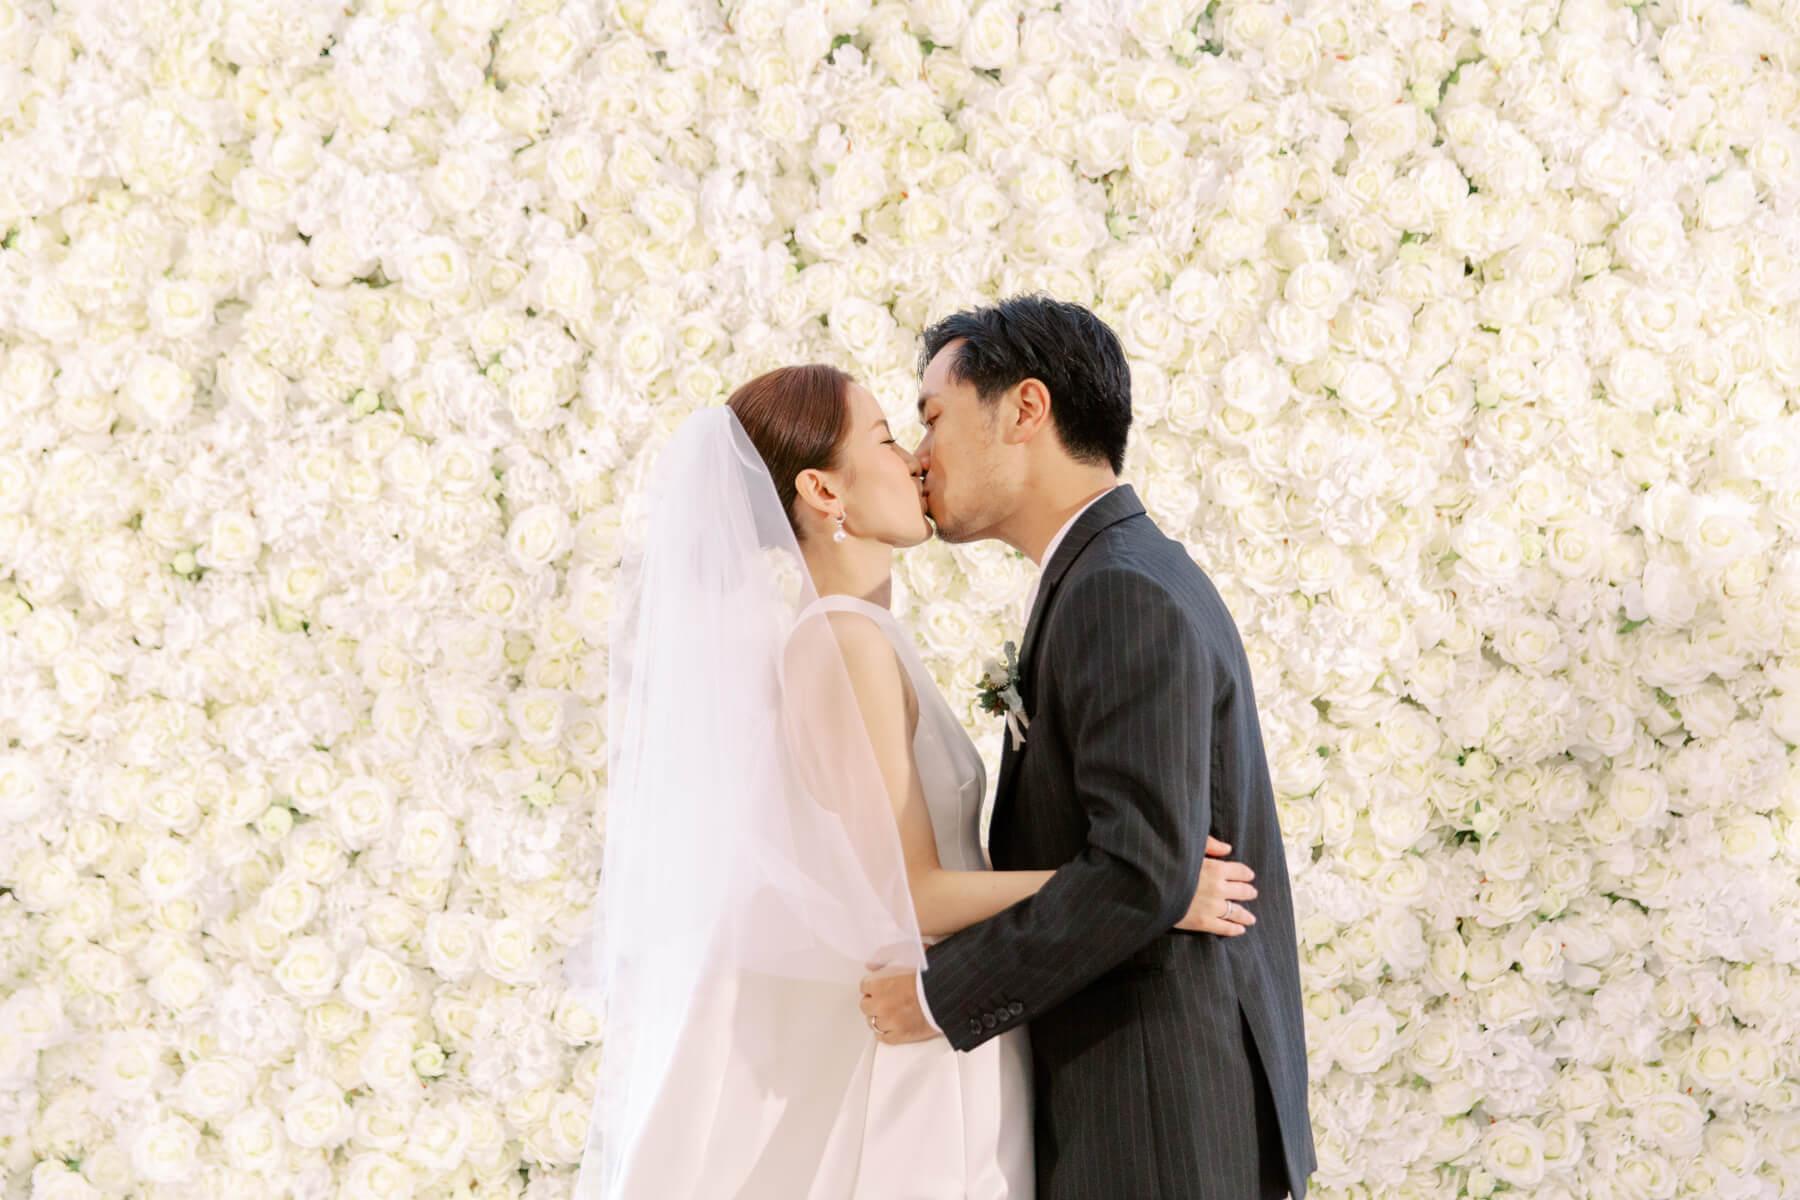 nikkiloveu-hongkong-weddingday-theupperhouse-as-015.jpg